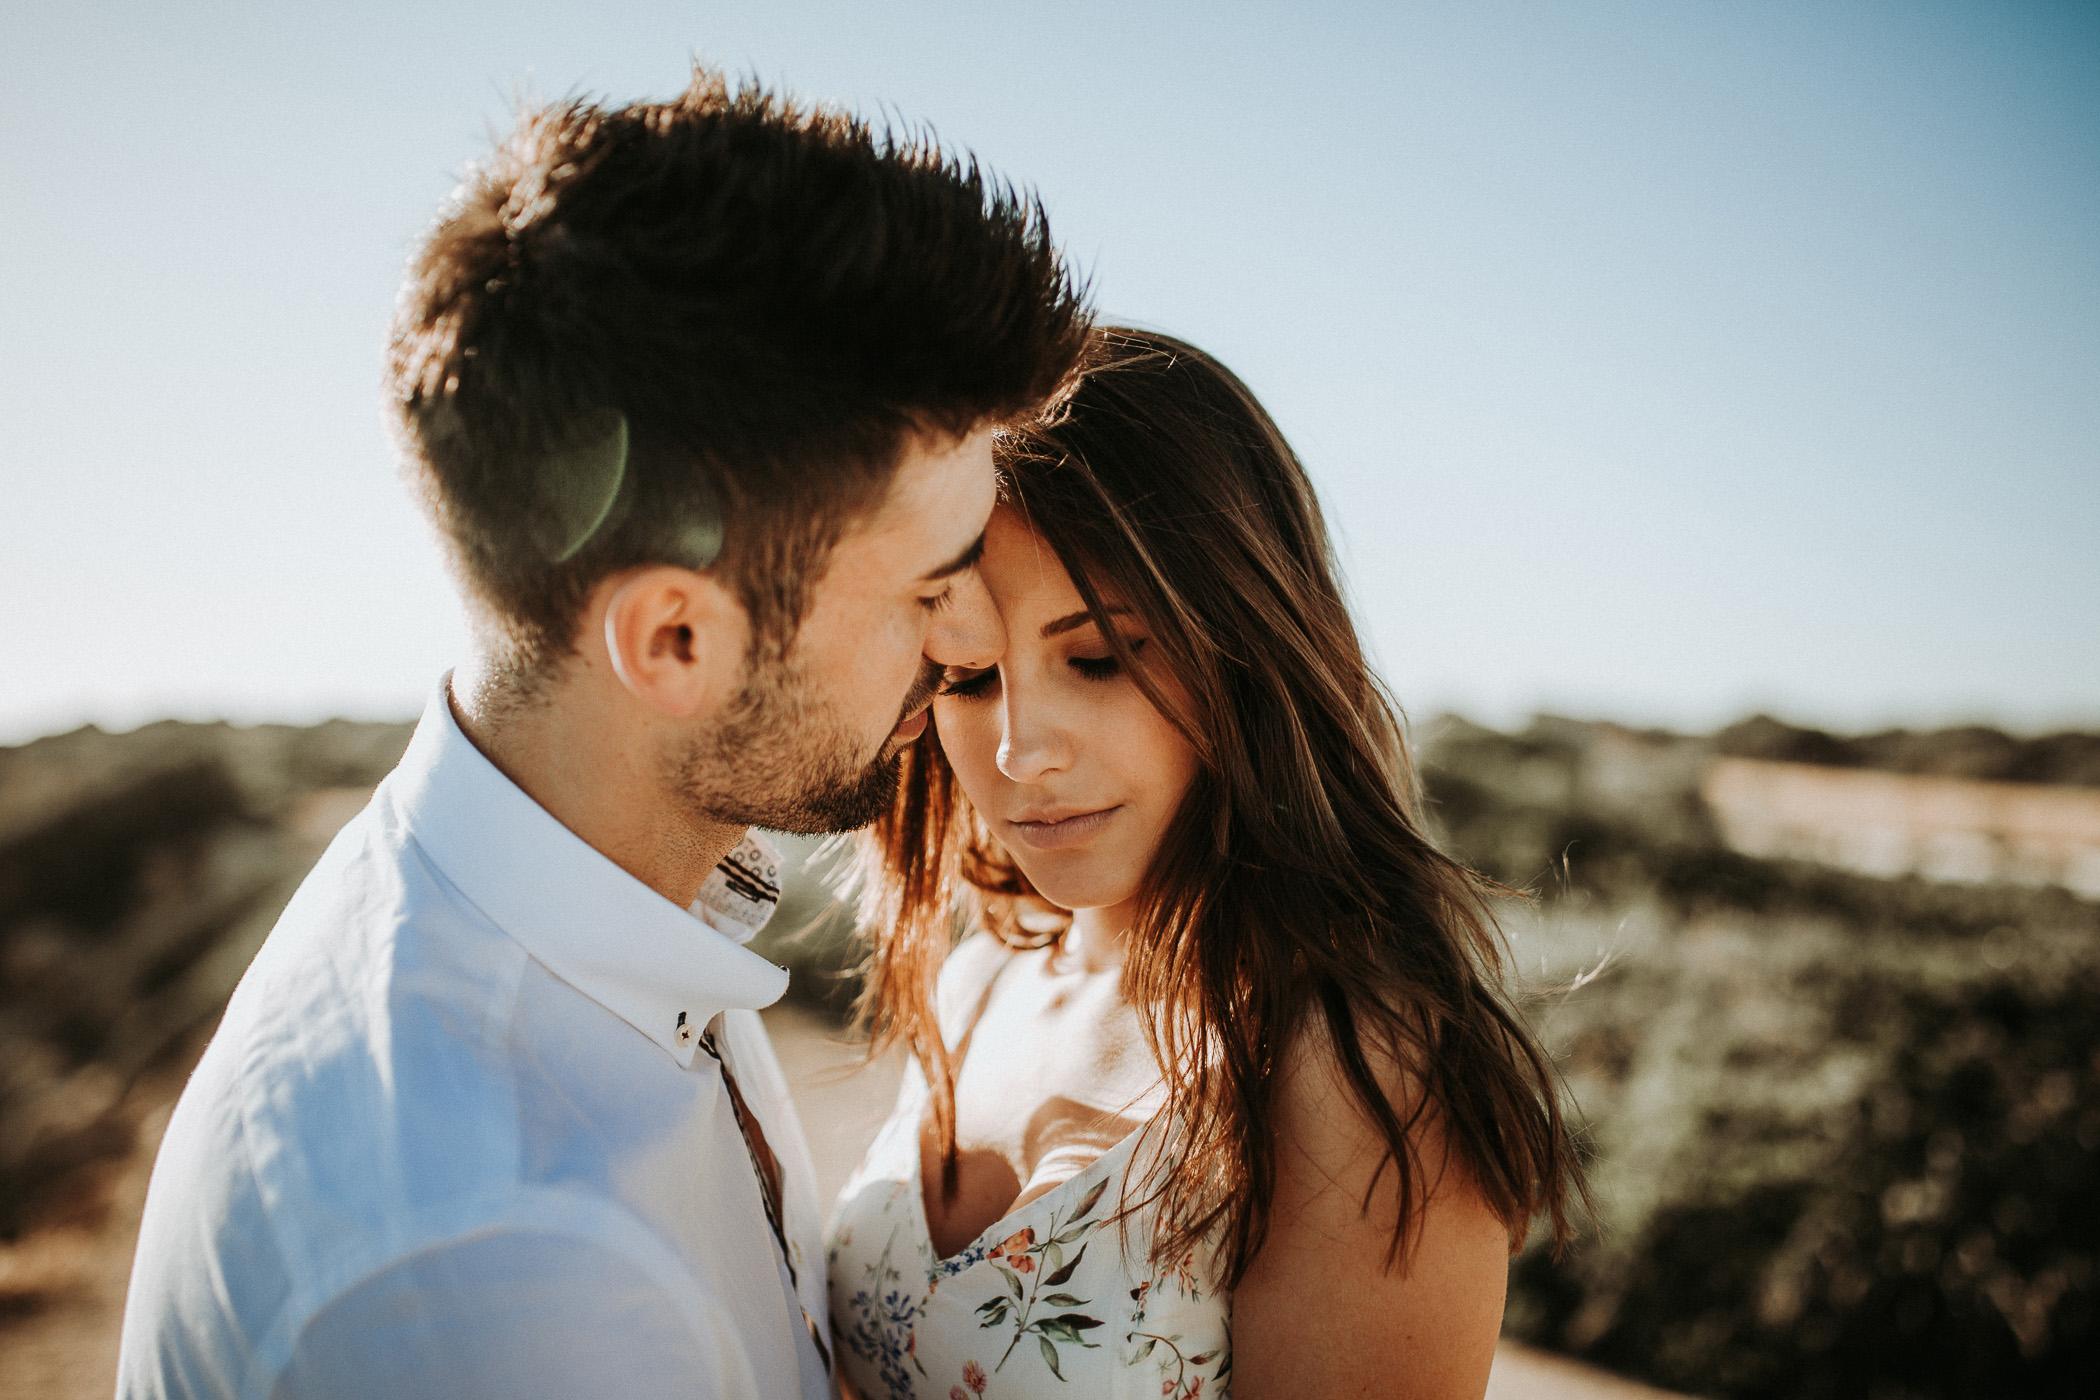 DanielaMarquardtPhotography_wedding_elopement_mallorca_spain_calapi_palma_lauraandtoni_328